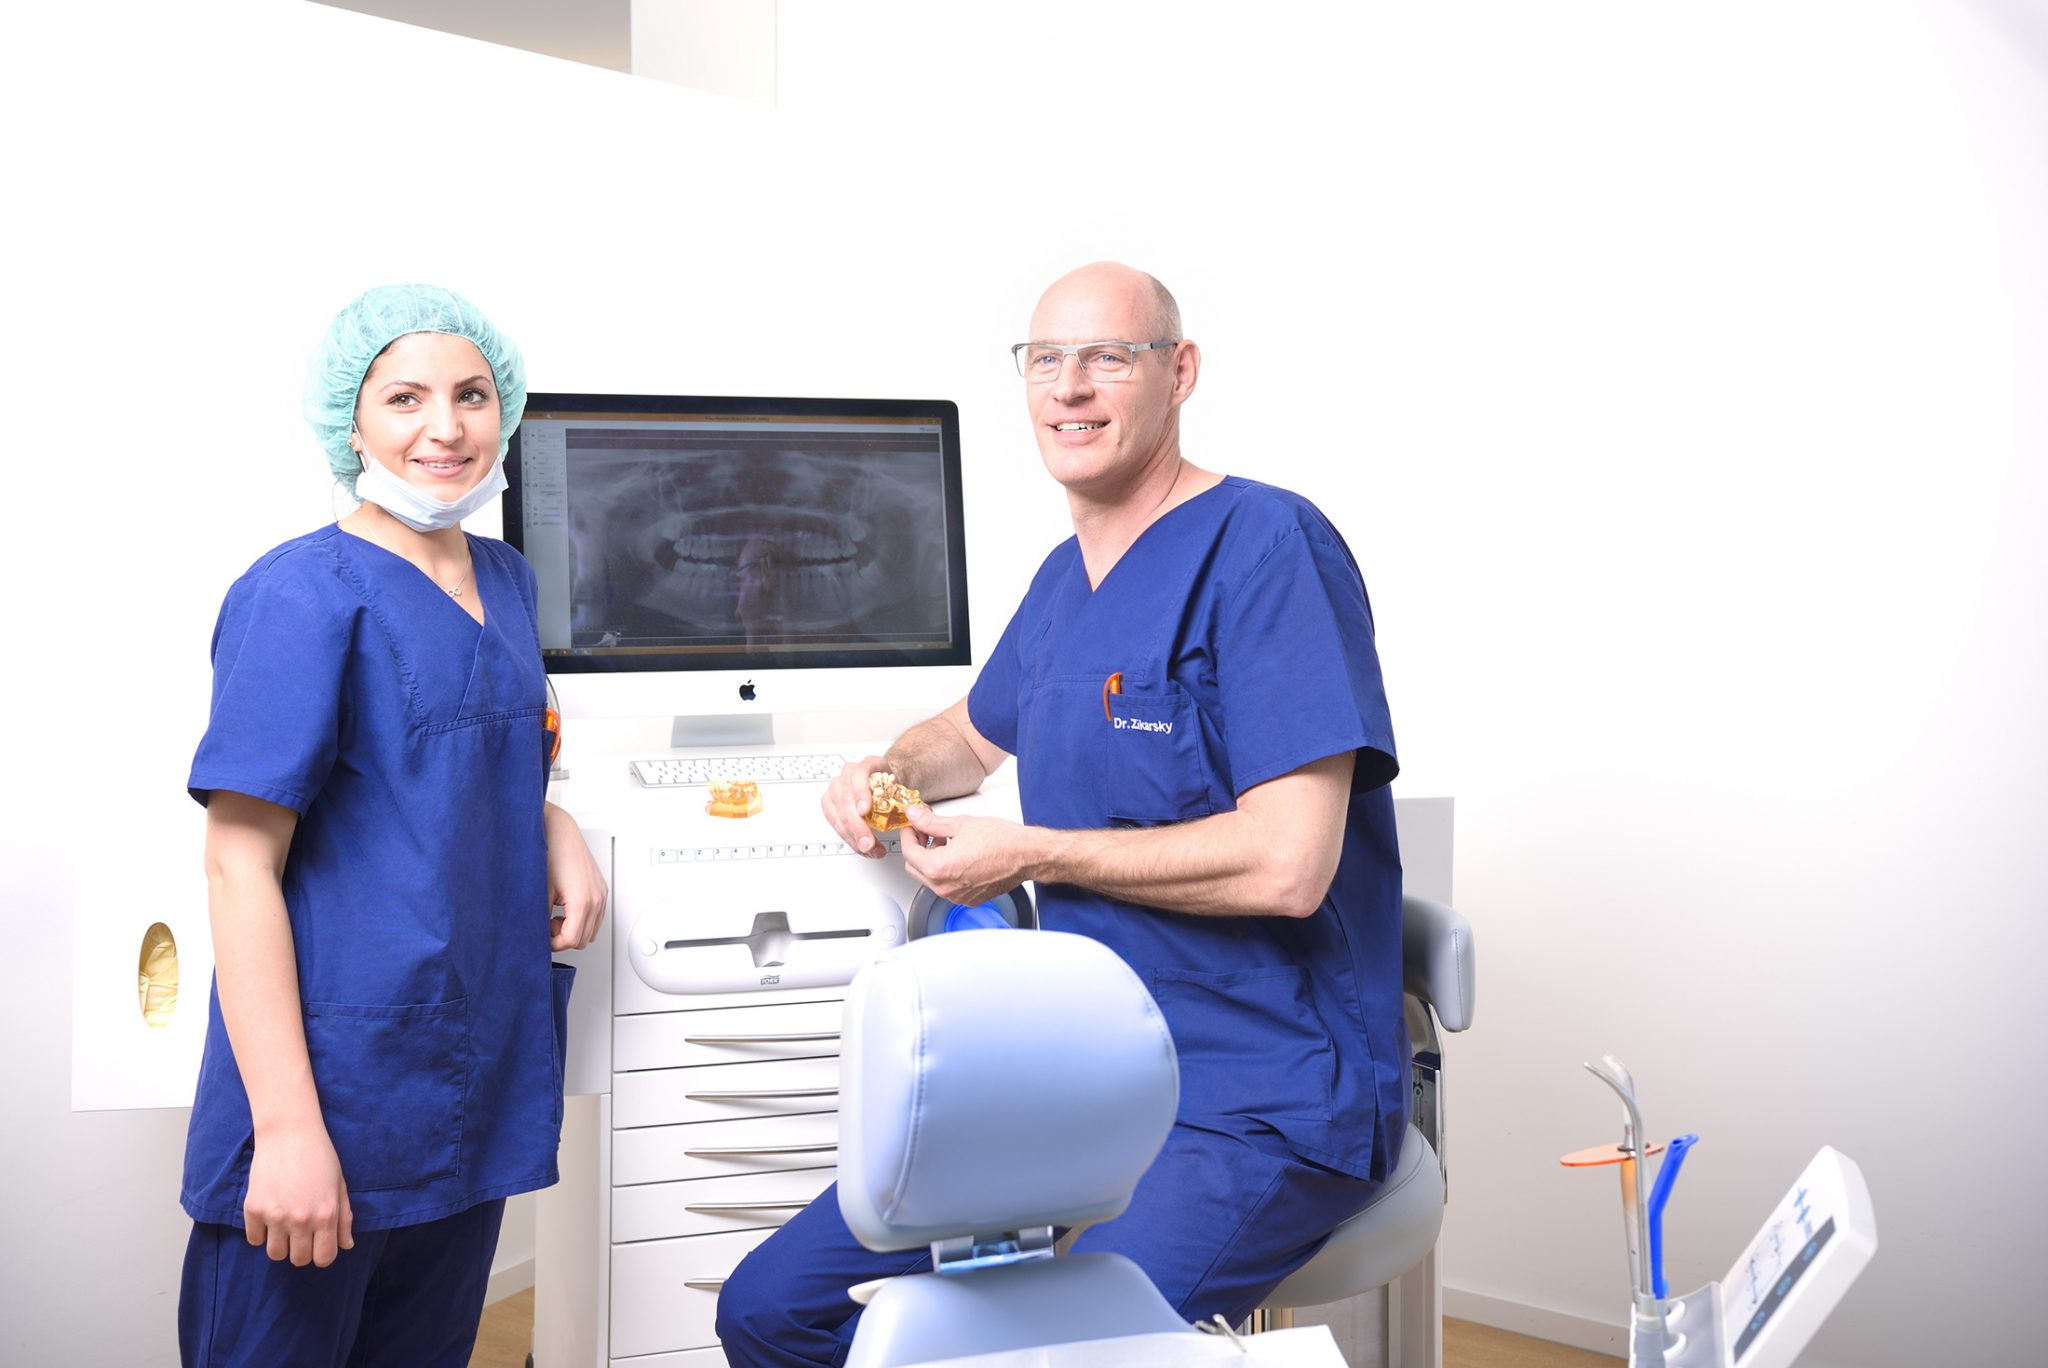 DVT und 3D-Planung: Mit Sicherheit zum Zahnimplantat | MKG Nürnberg, Dr. Dr. Zikarsky & Kollegen